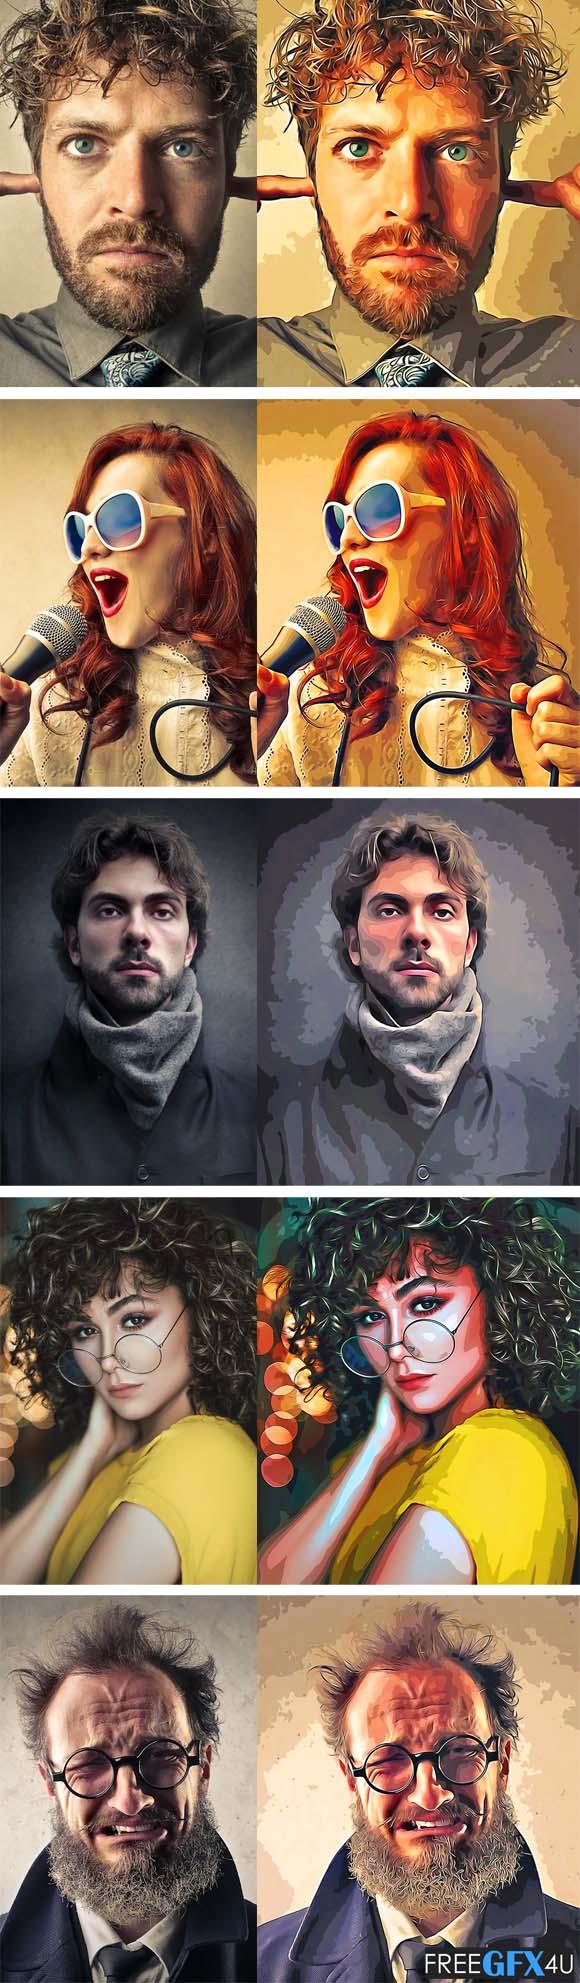 Oil Paint Cartoonizer Action